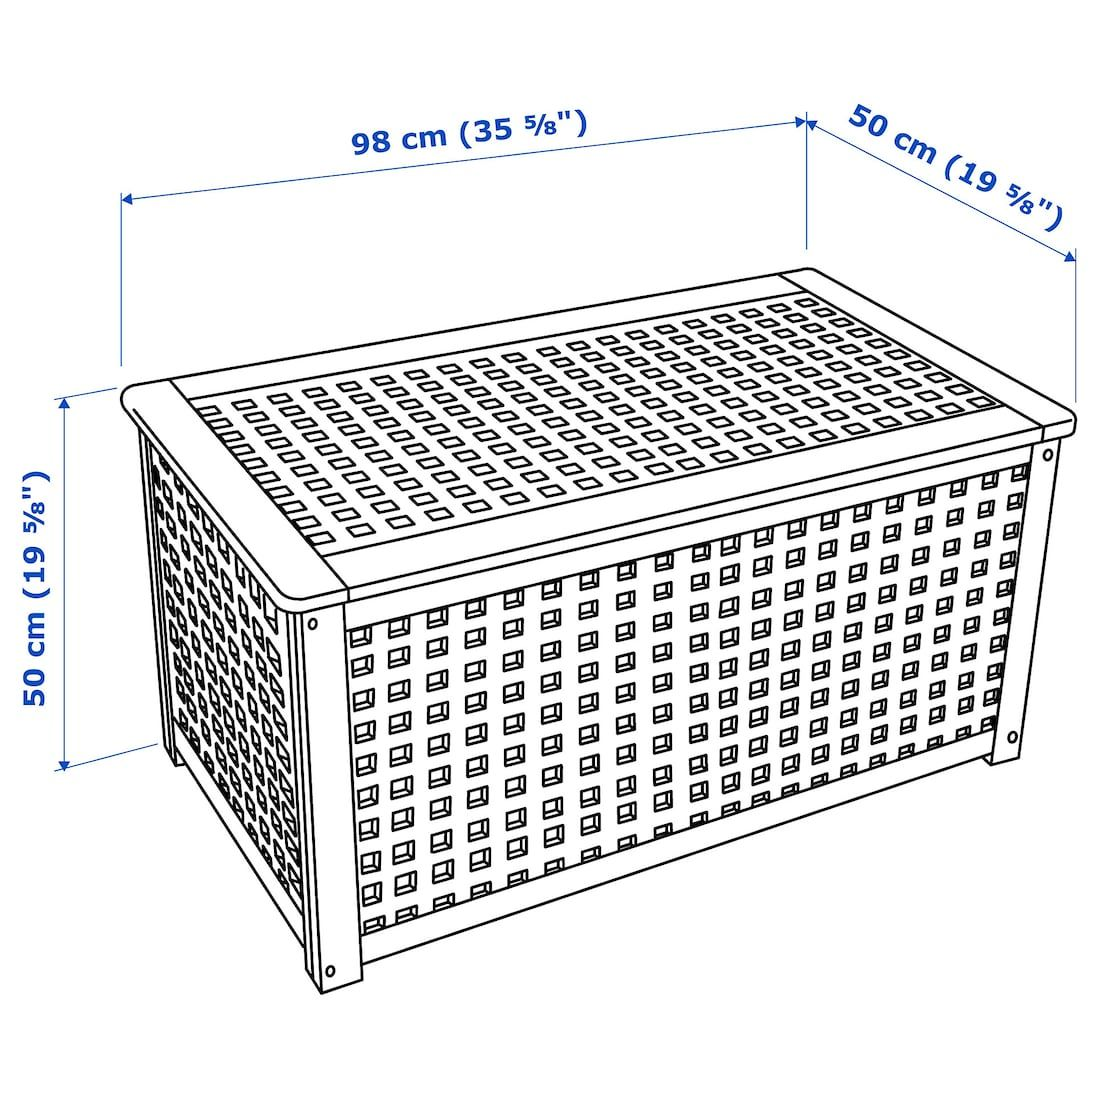 Hol Acacia Storage Table 98x50 Cm Ikea Table Storage Ikea Storage Spaces [ 1100 x 1100 Pixel ]